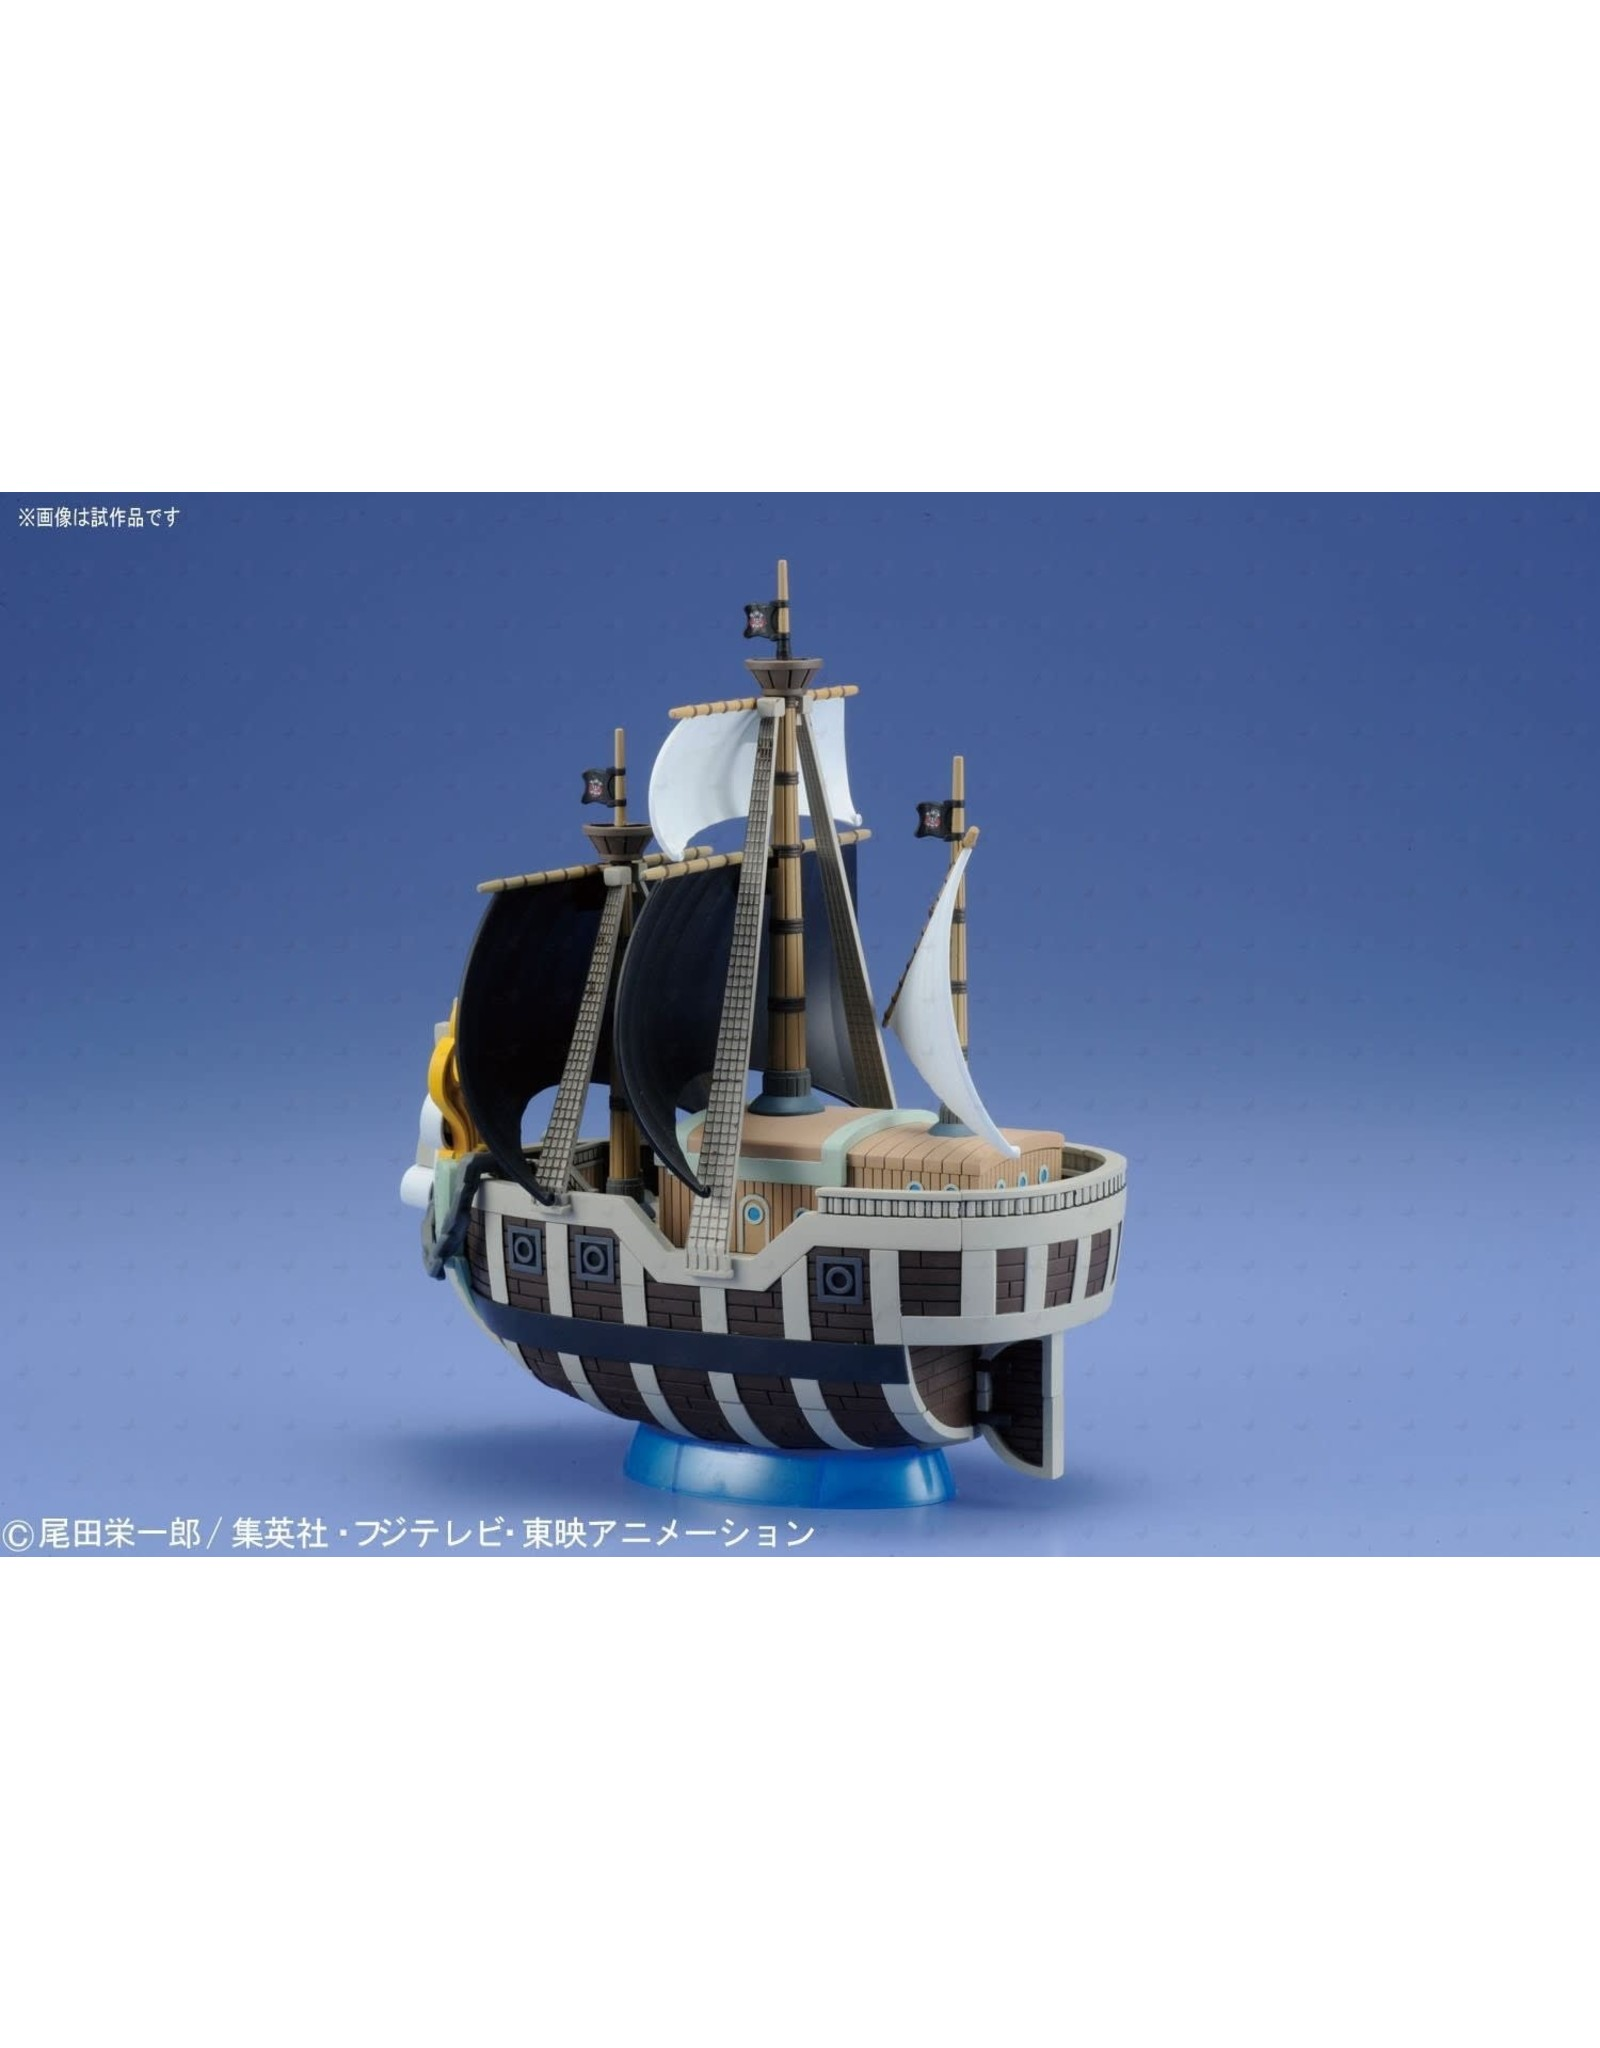 Bandai ONE PIECE - Model Kit - Ship - Spade Pirates - 15 CM